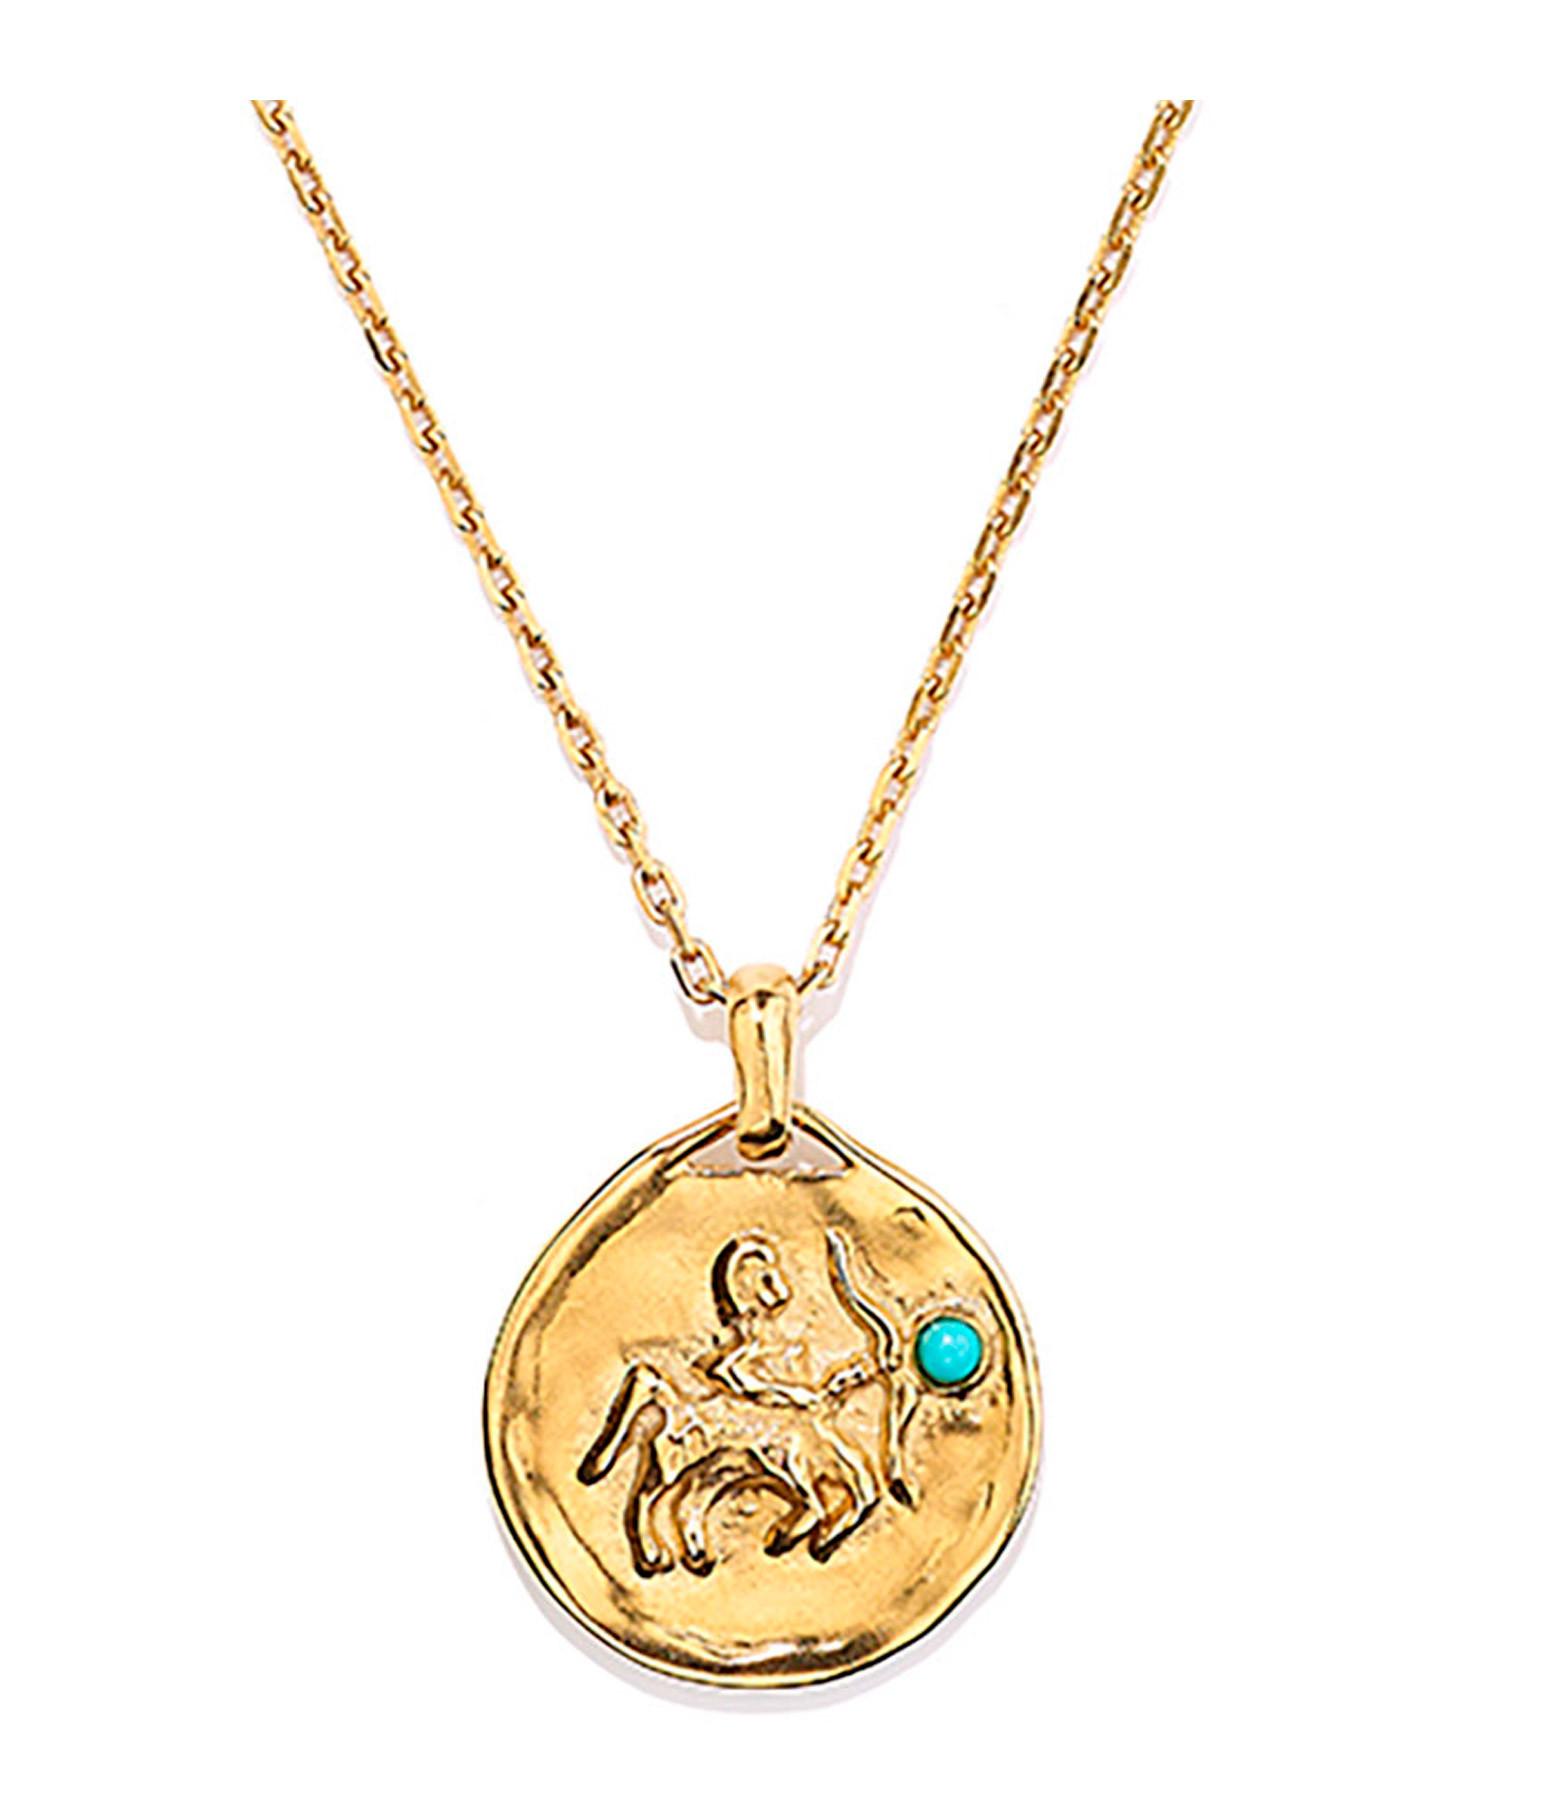 GOOSSENS - Collier Talisman Mini Astro Sagittaire Turquoise Plaqué Or